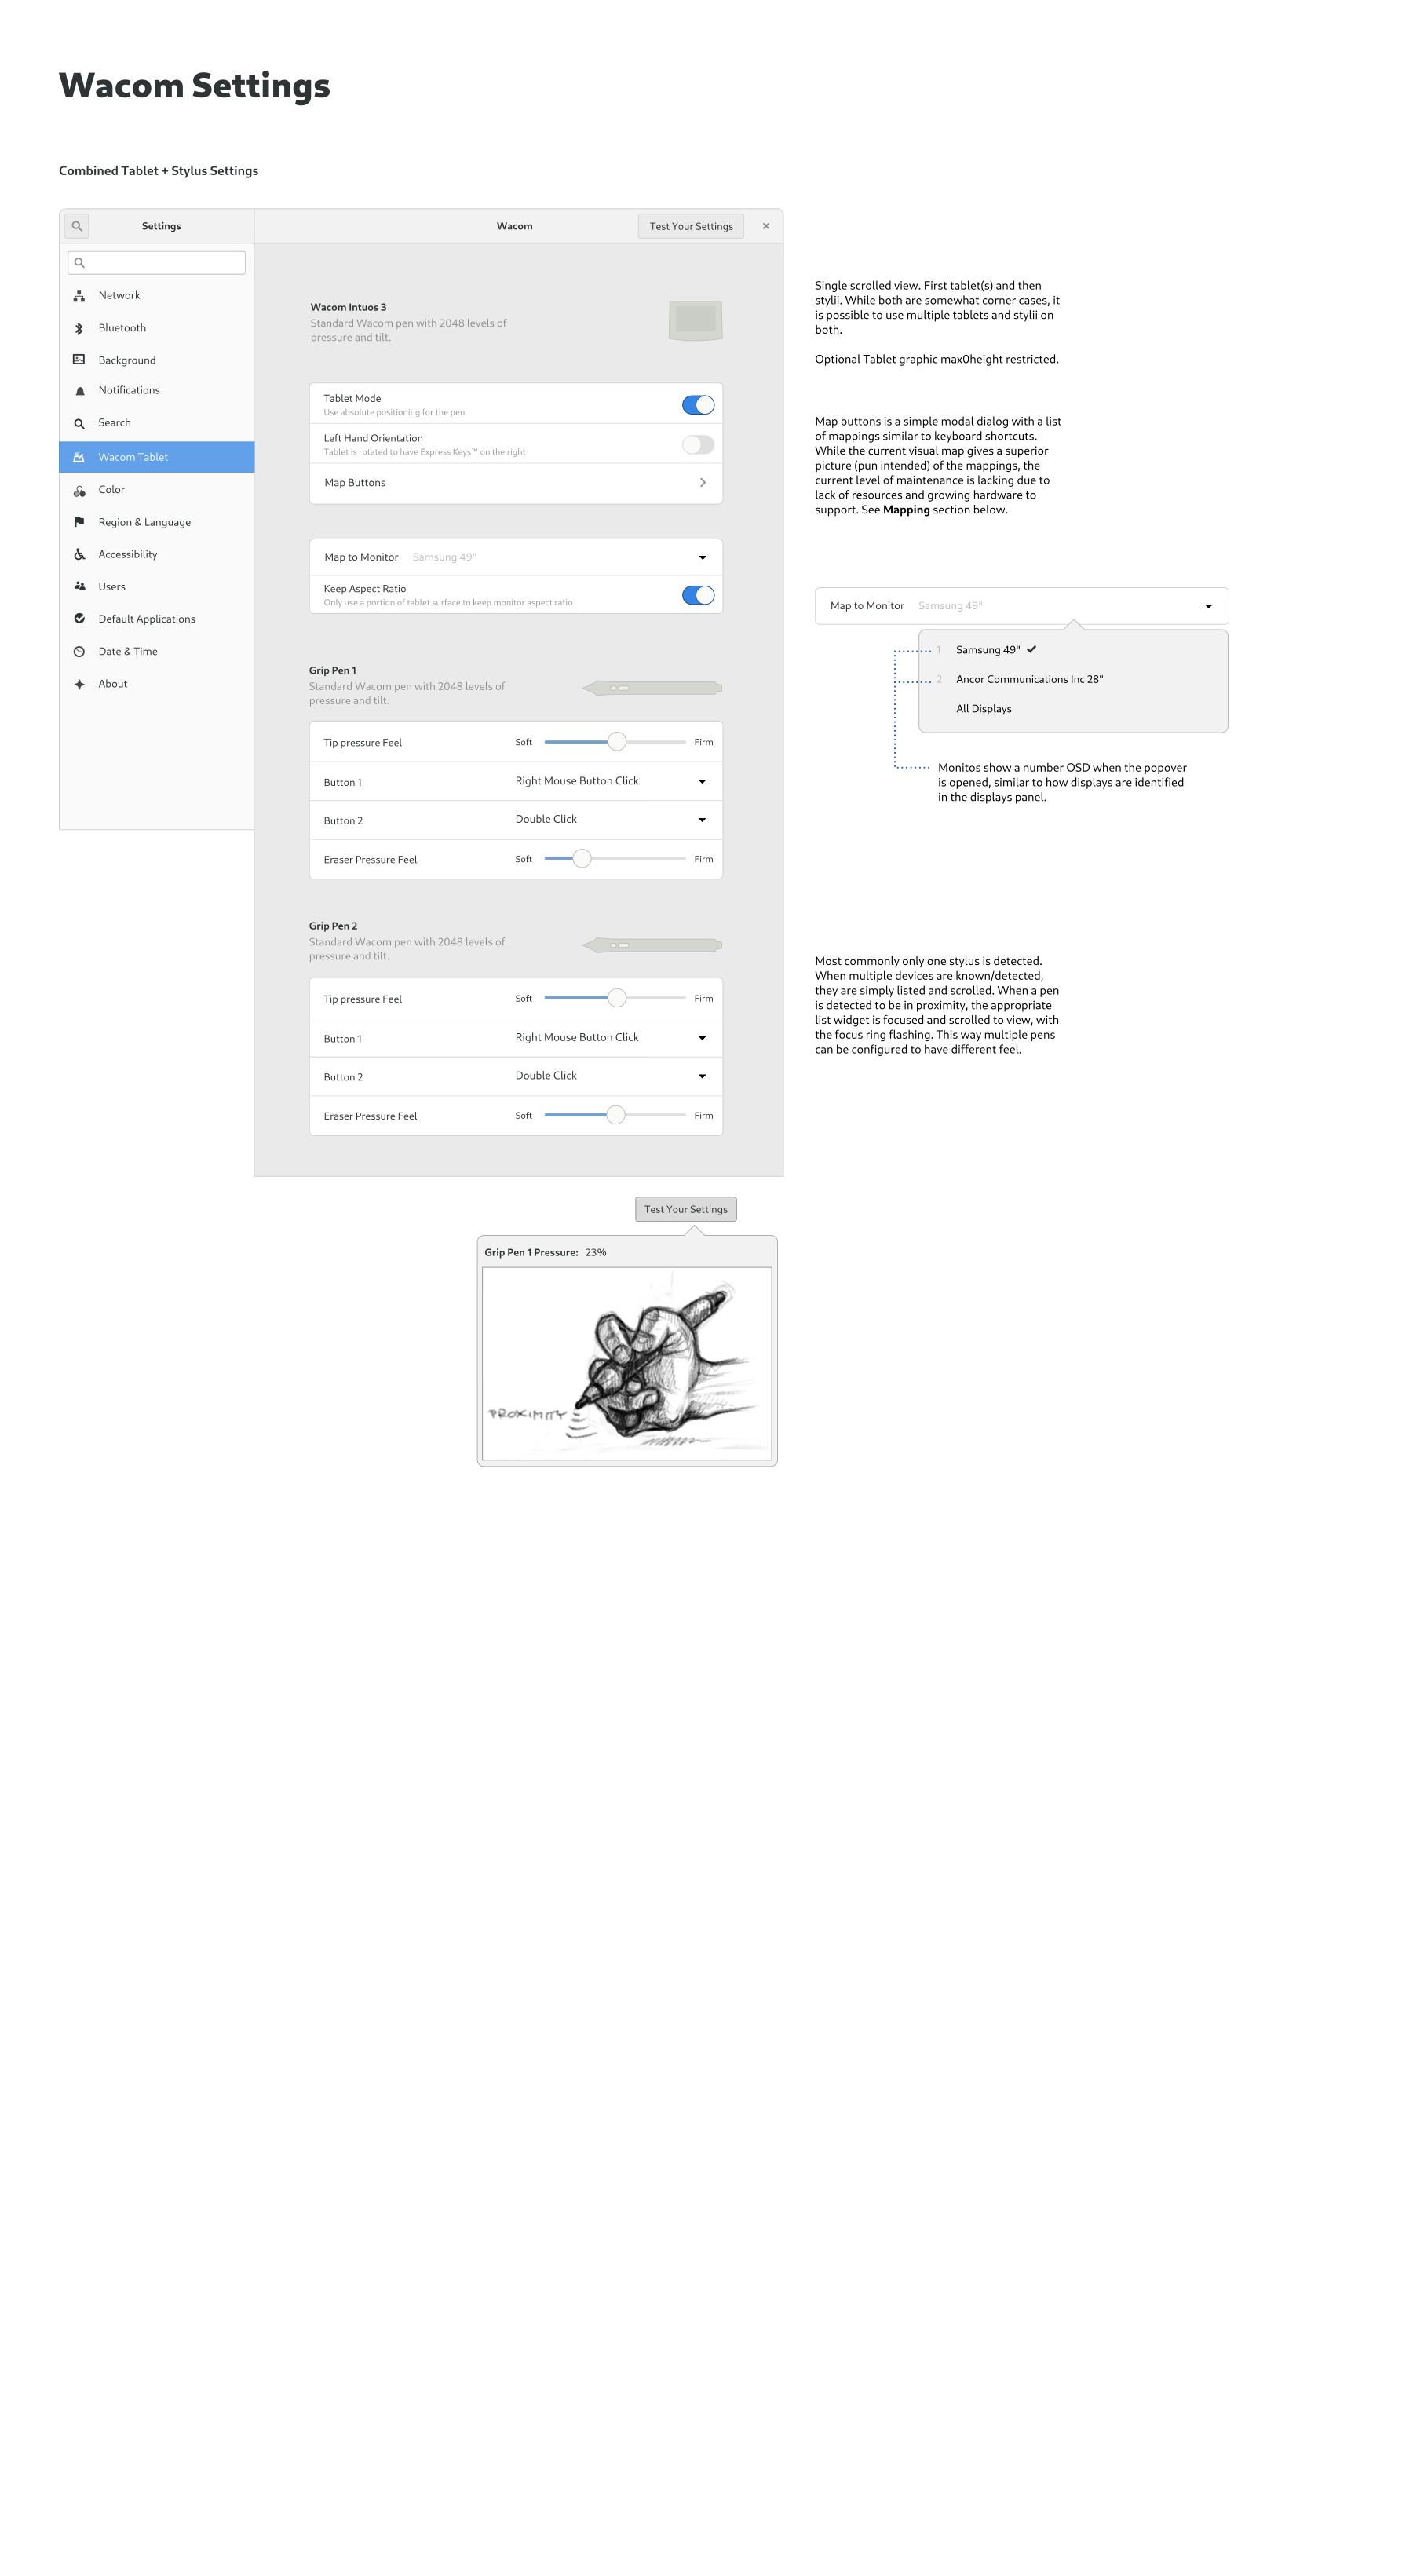 https://gitlab.gnome.org/Teams/Design/settings-mockups/raw/master/wacom/wacom-settings.png